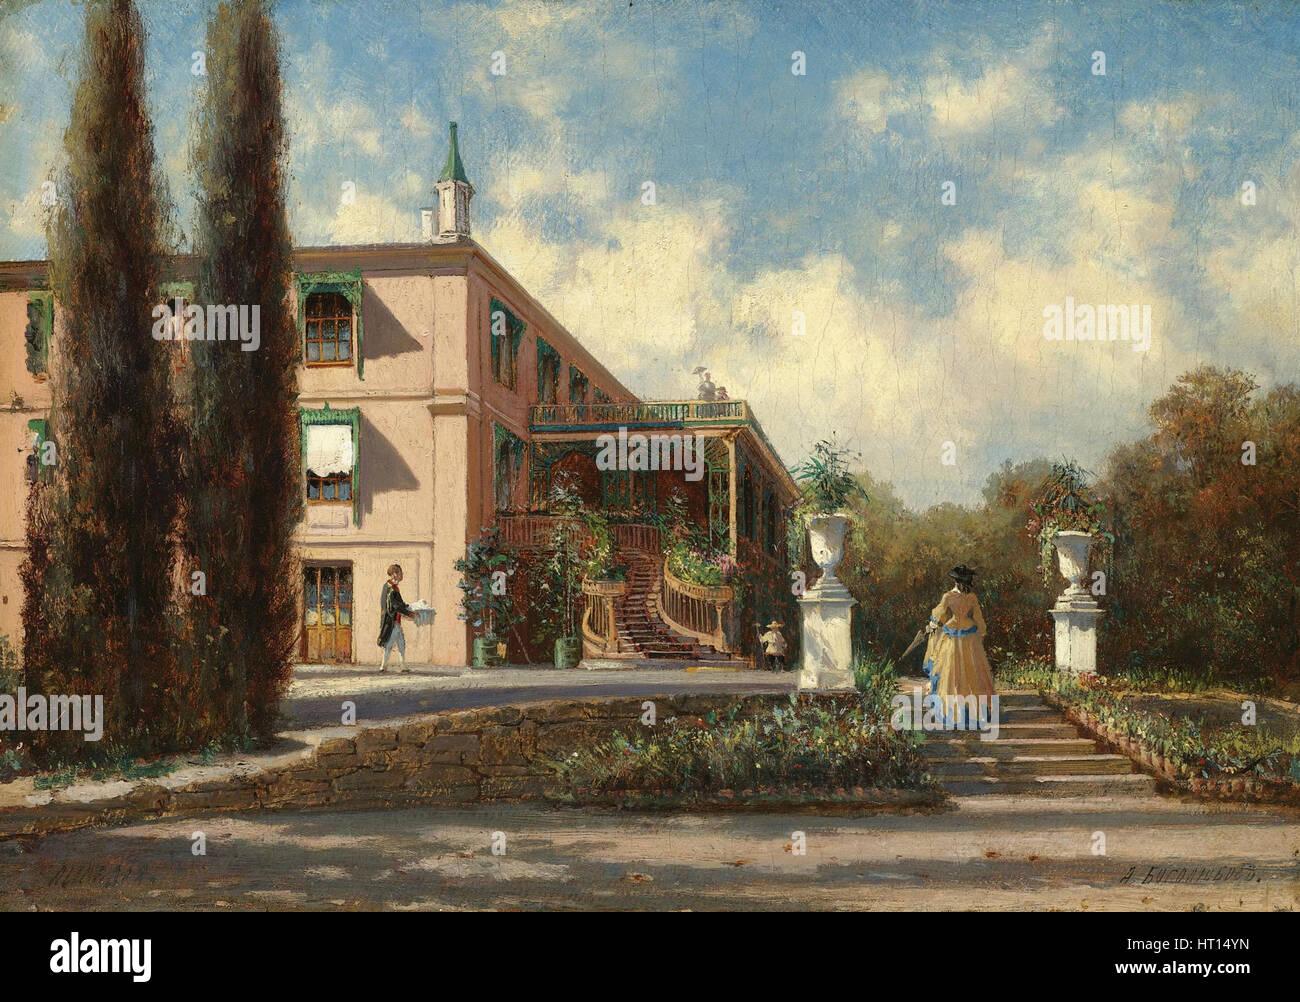 The Livadiya palace. Artist: Bogolyubov, Alexei Petrovich (1824-1896) - Stock Image